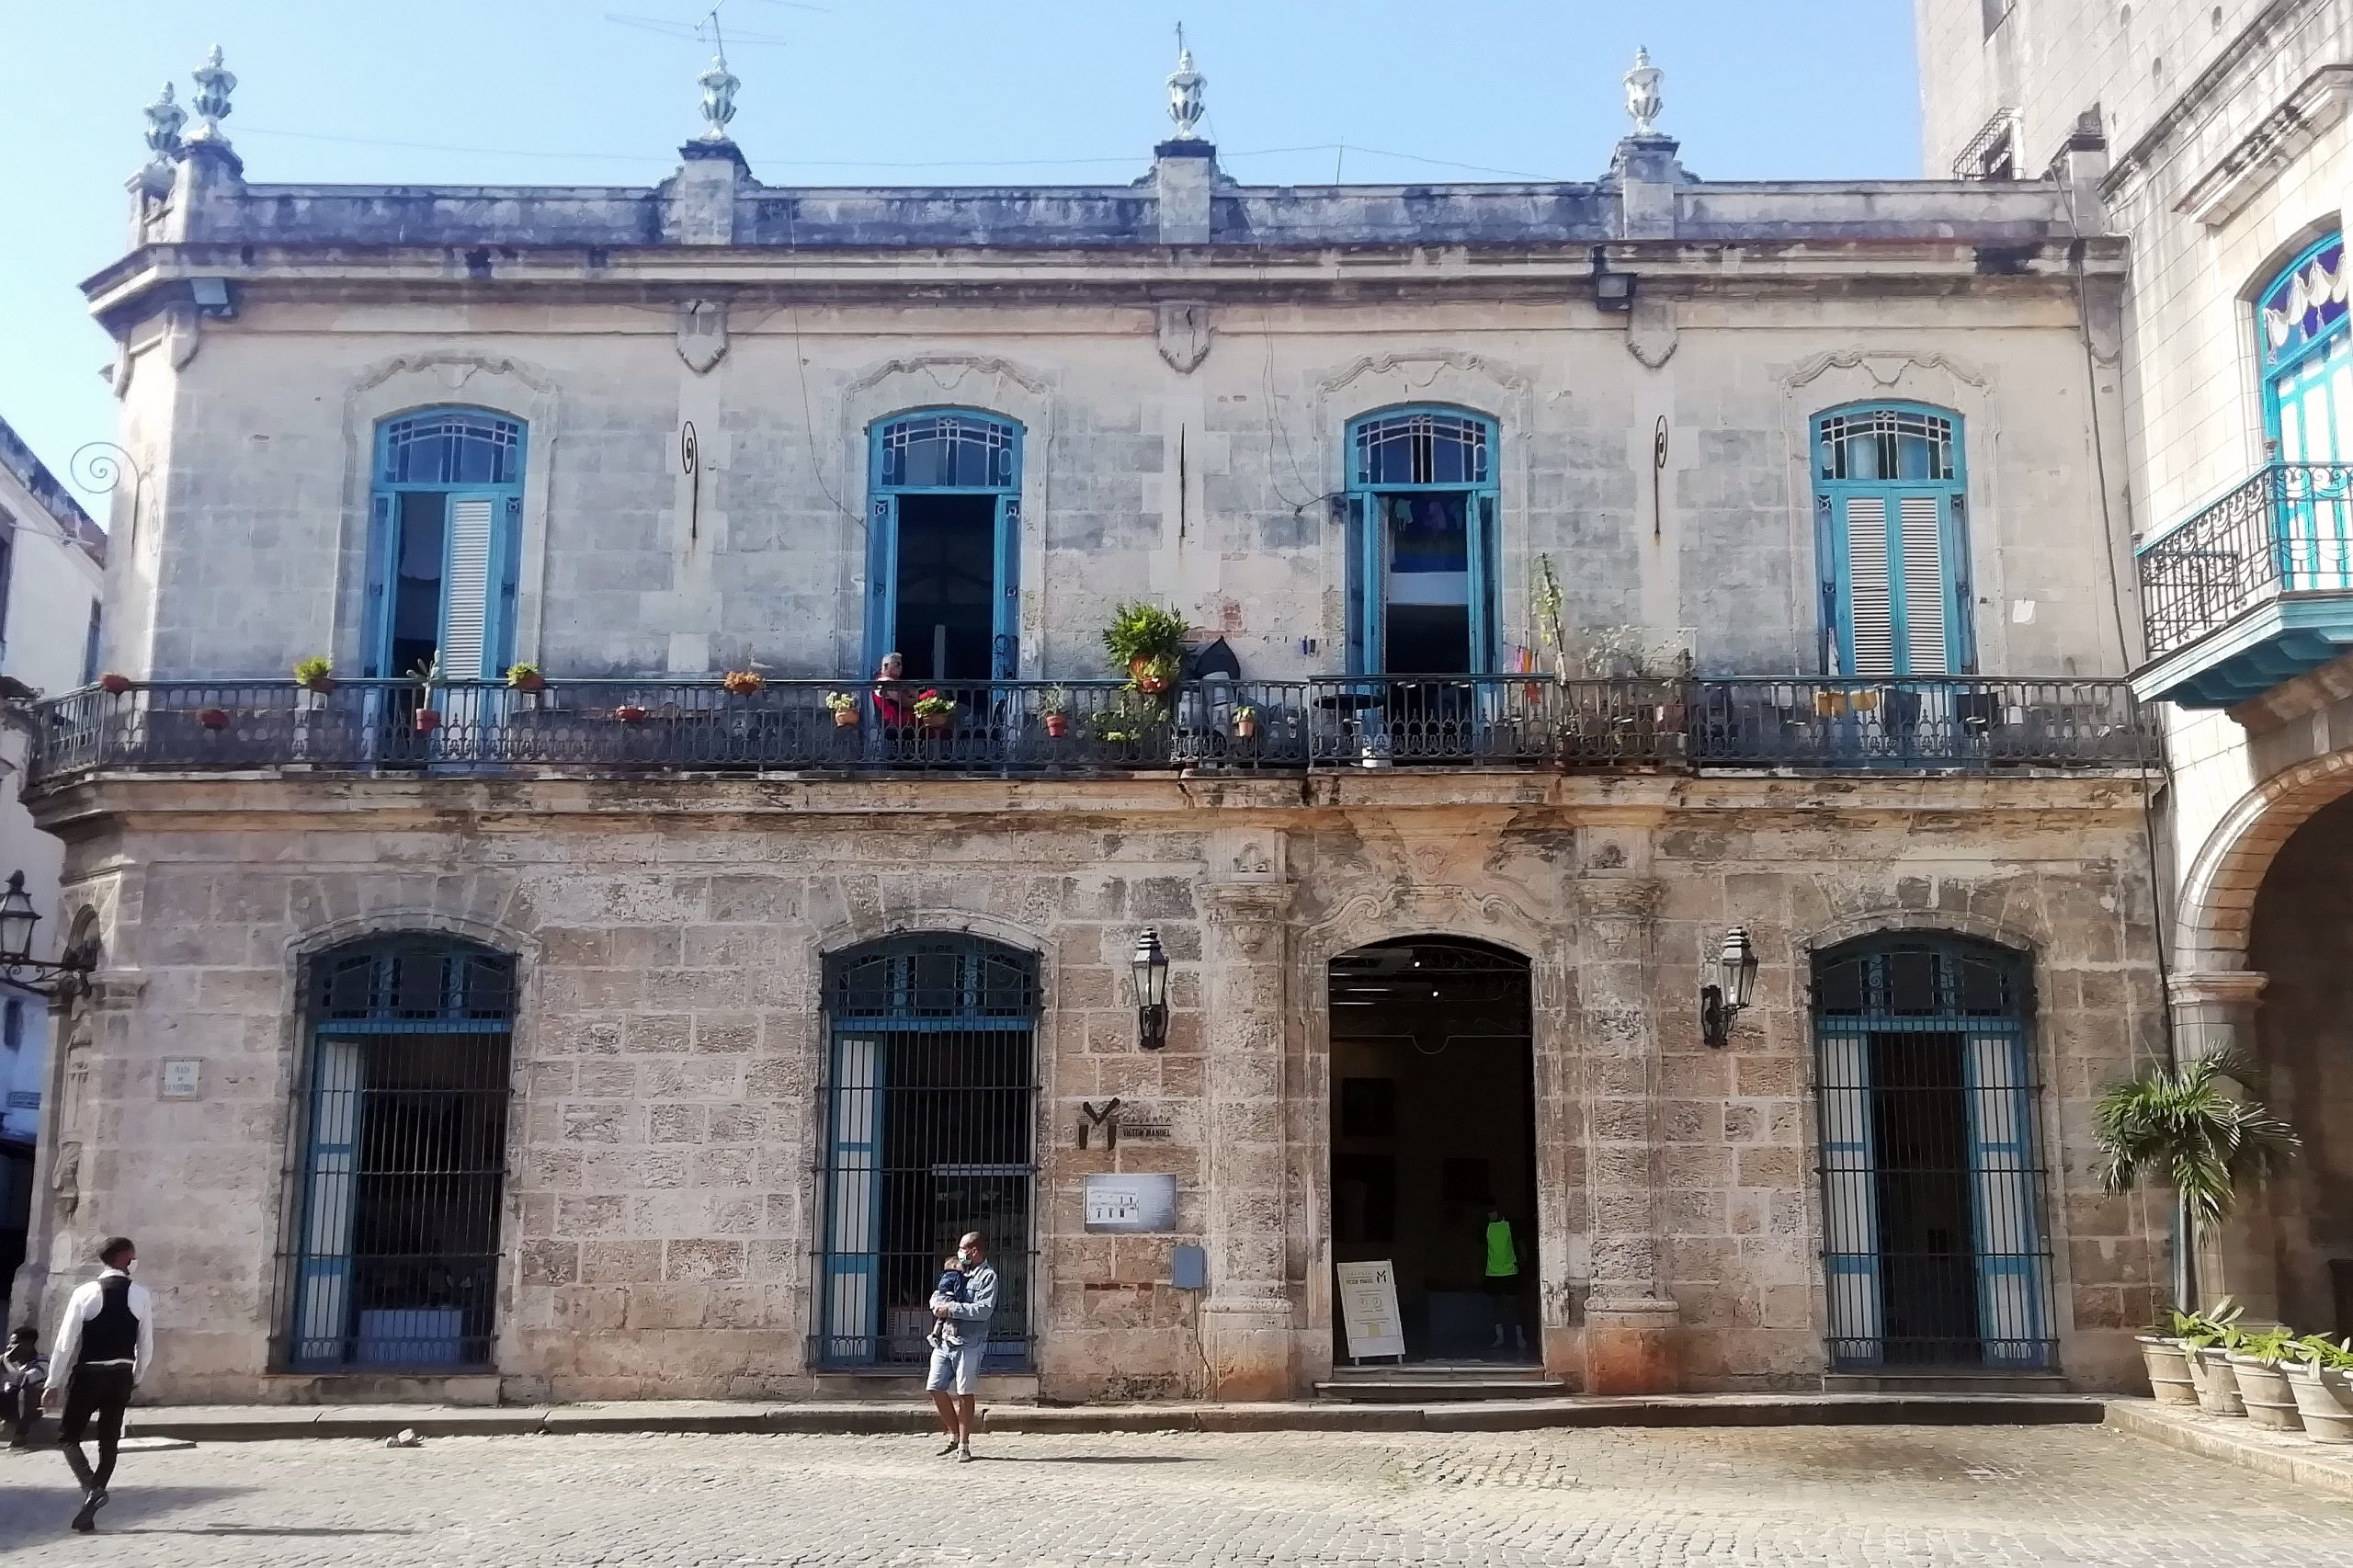 Casa de Banos Plaza de la Catedral la Habana scaled